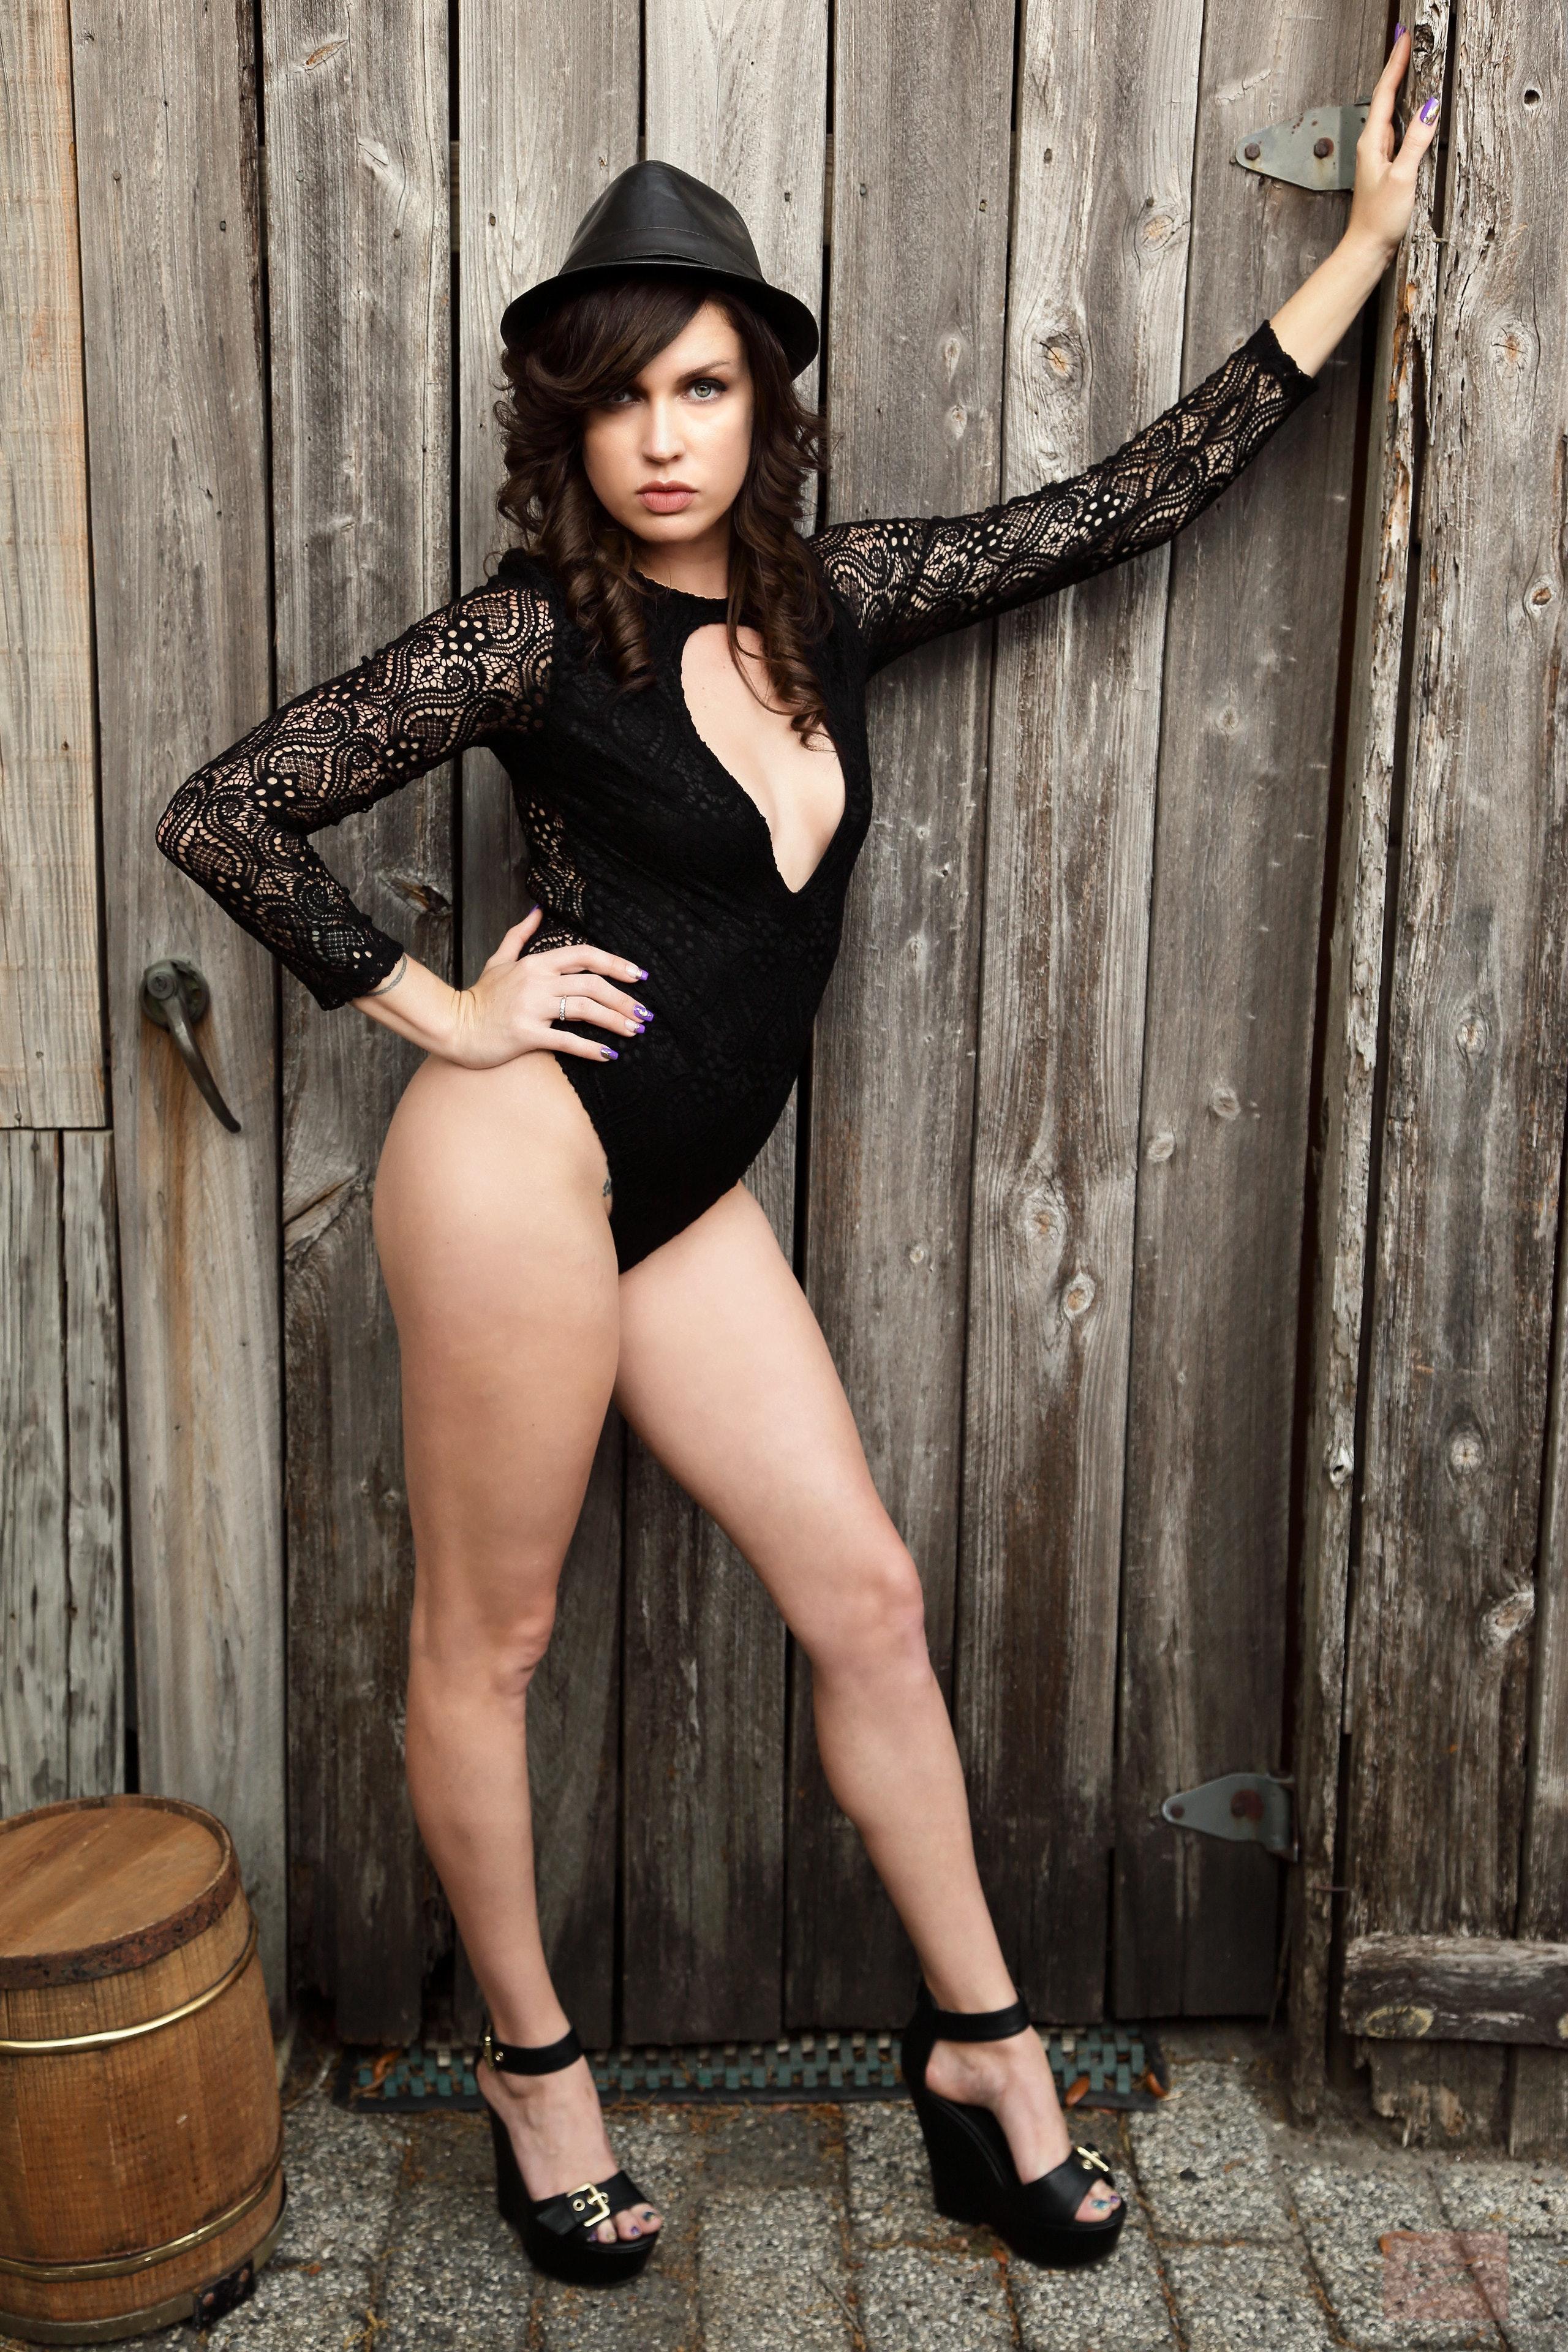 Krystina Renee Gillispie's Model portfolio